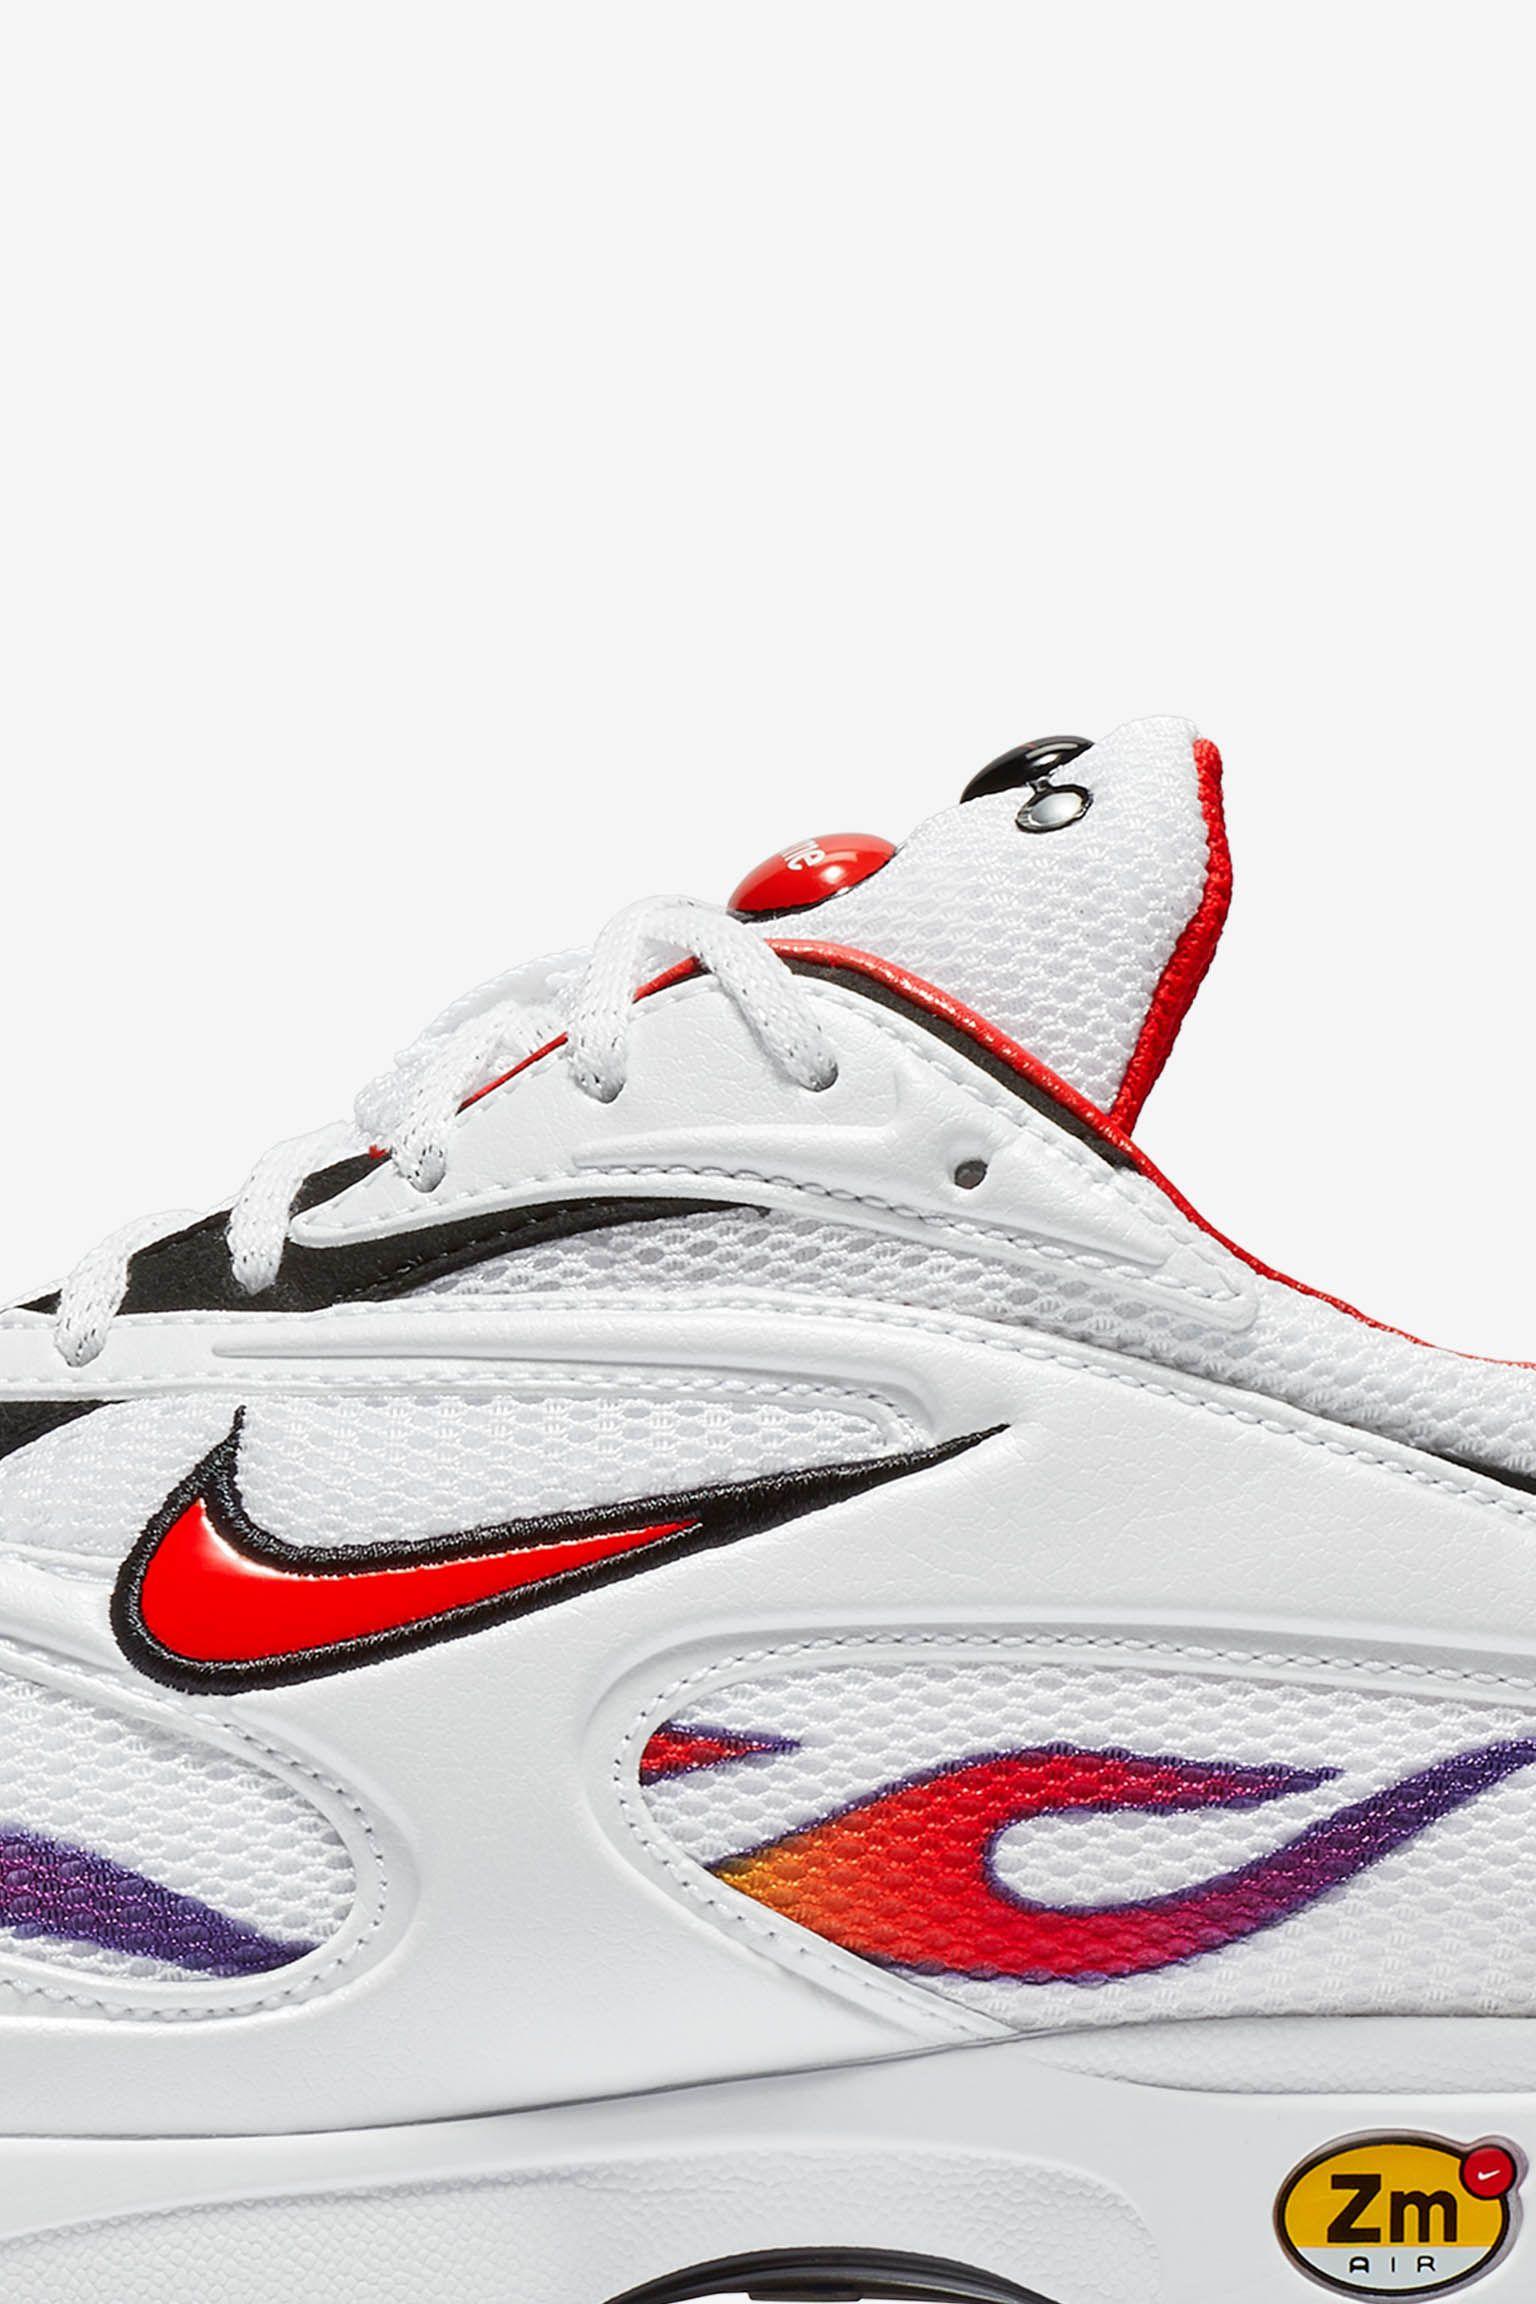 【NIKE公式】ナイキ ズーム ストリーク スペクトラム プラス x シュプリーム 'White & Habanero Red' (AQ1279-100 / Zoom Streak Spectrum Plus Supreme)